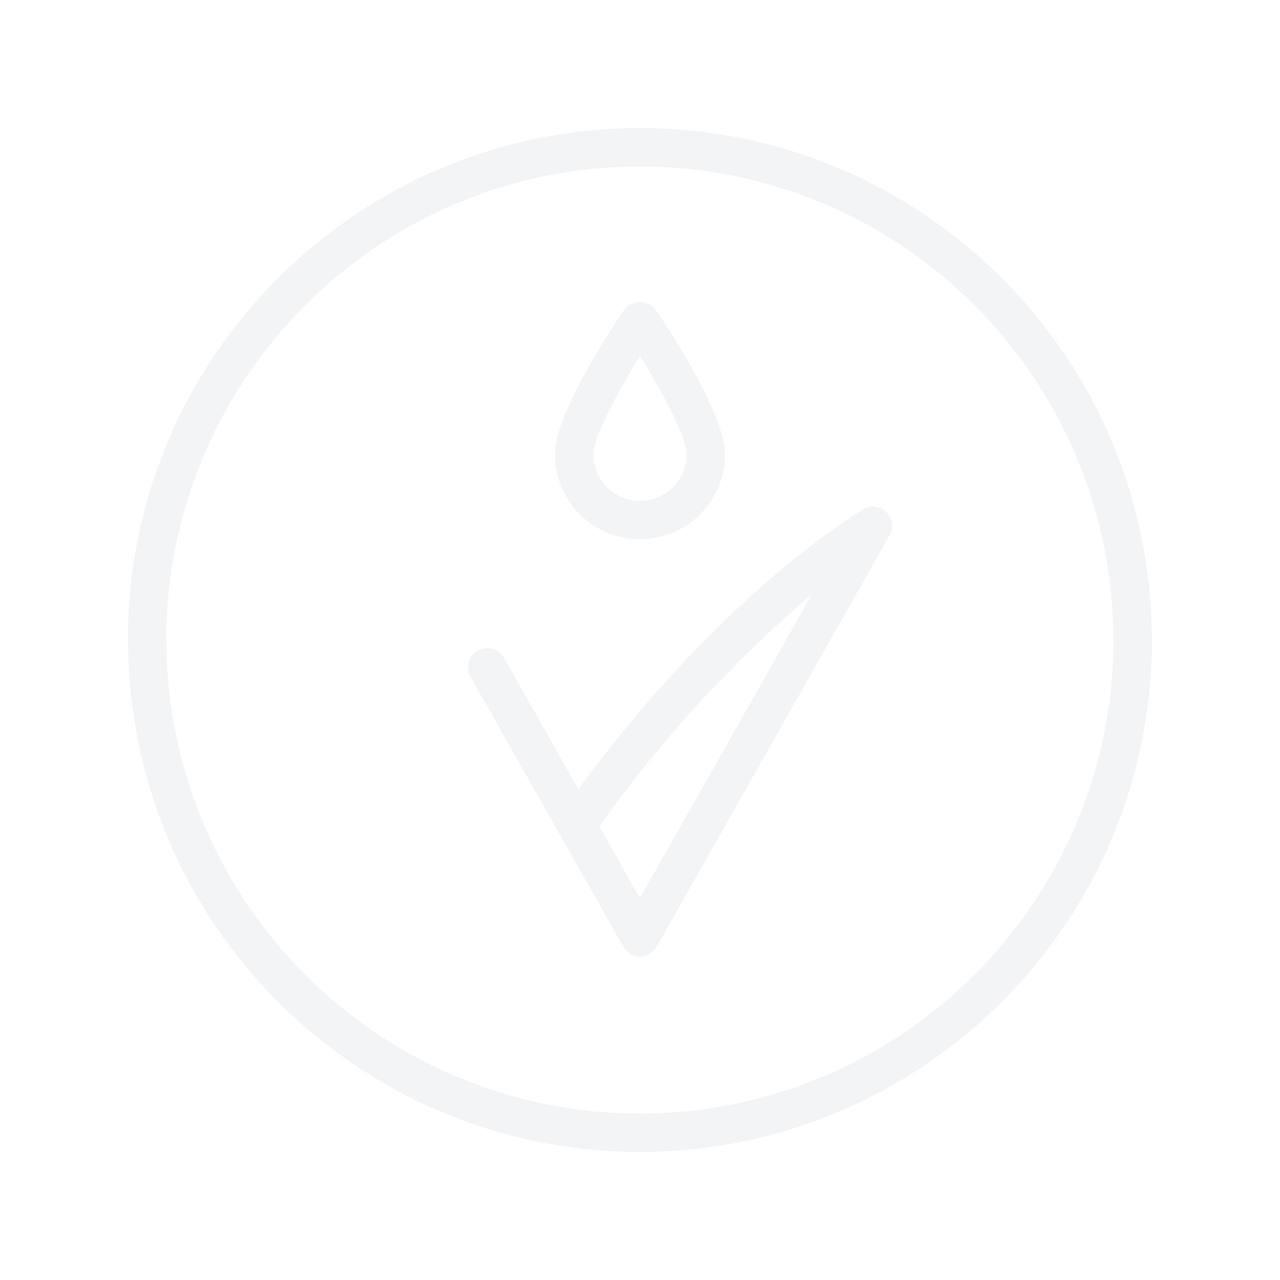 Clarins Everlasting Foundation+ SPF15 No.108 Sand 30ml